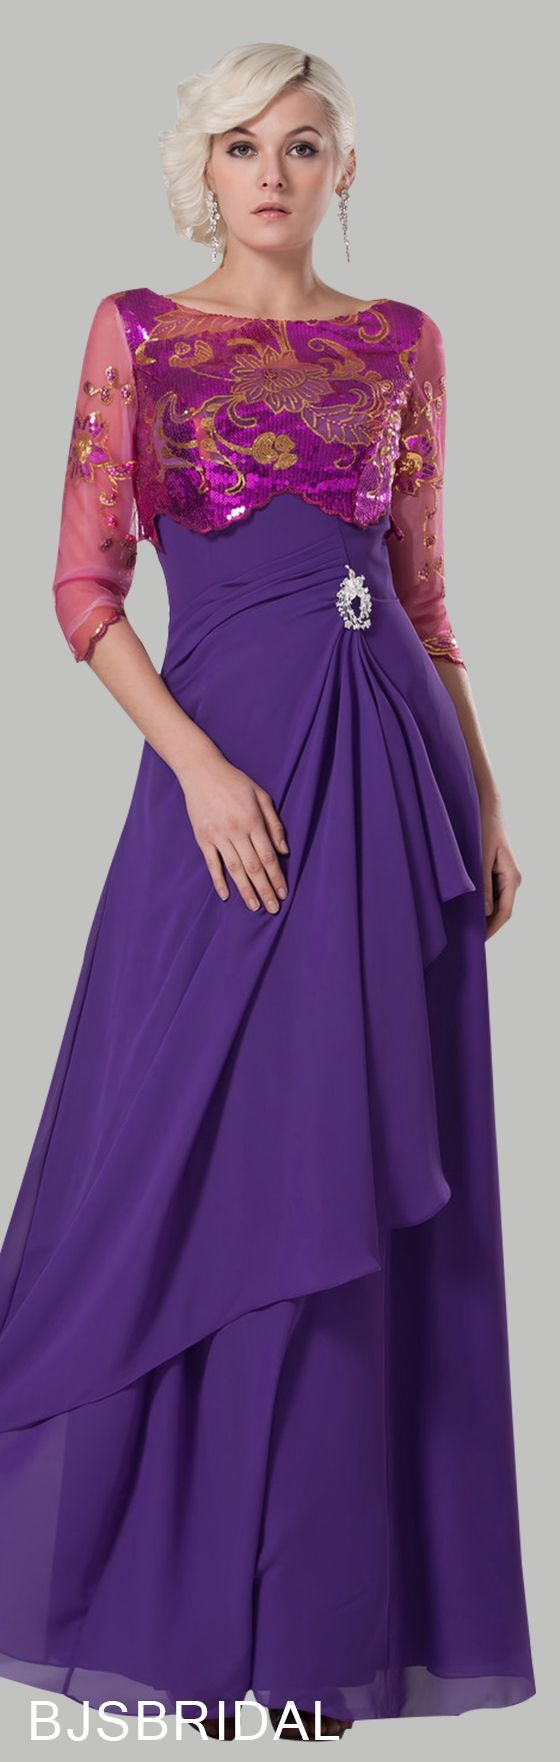 Bonito Amy Louise Trajes De Novia Modelo - Vestido de Novia Para Las ...